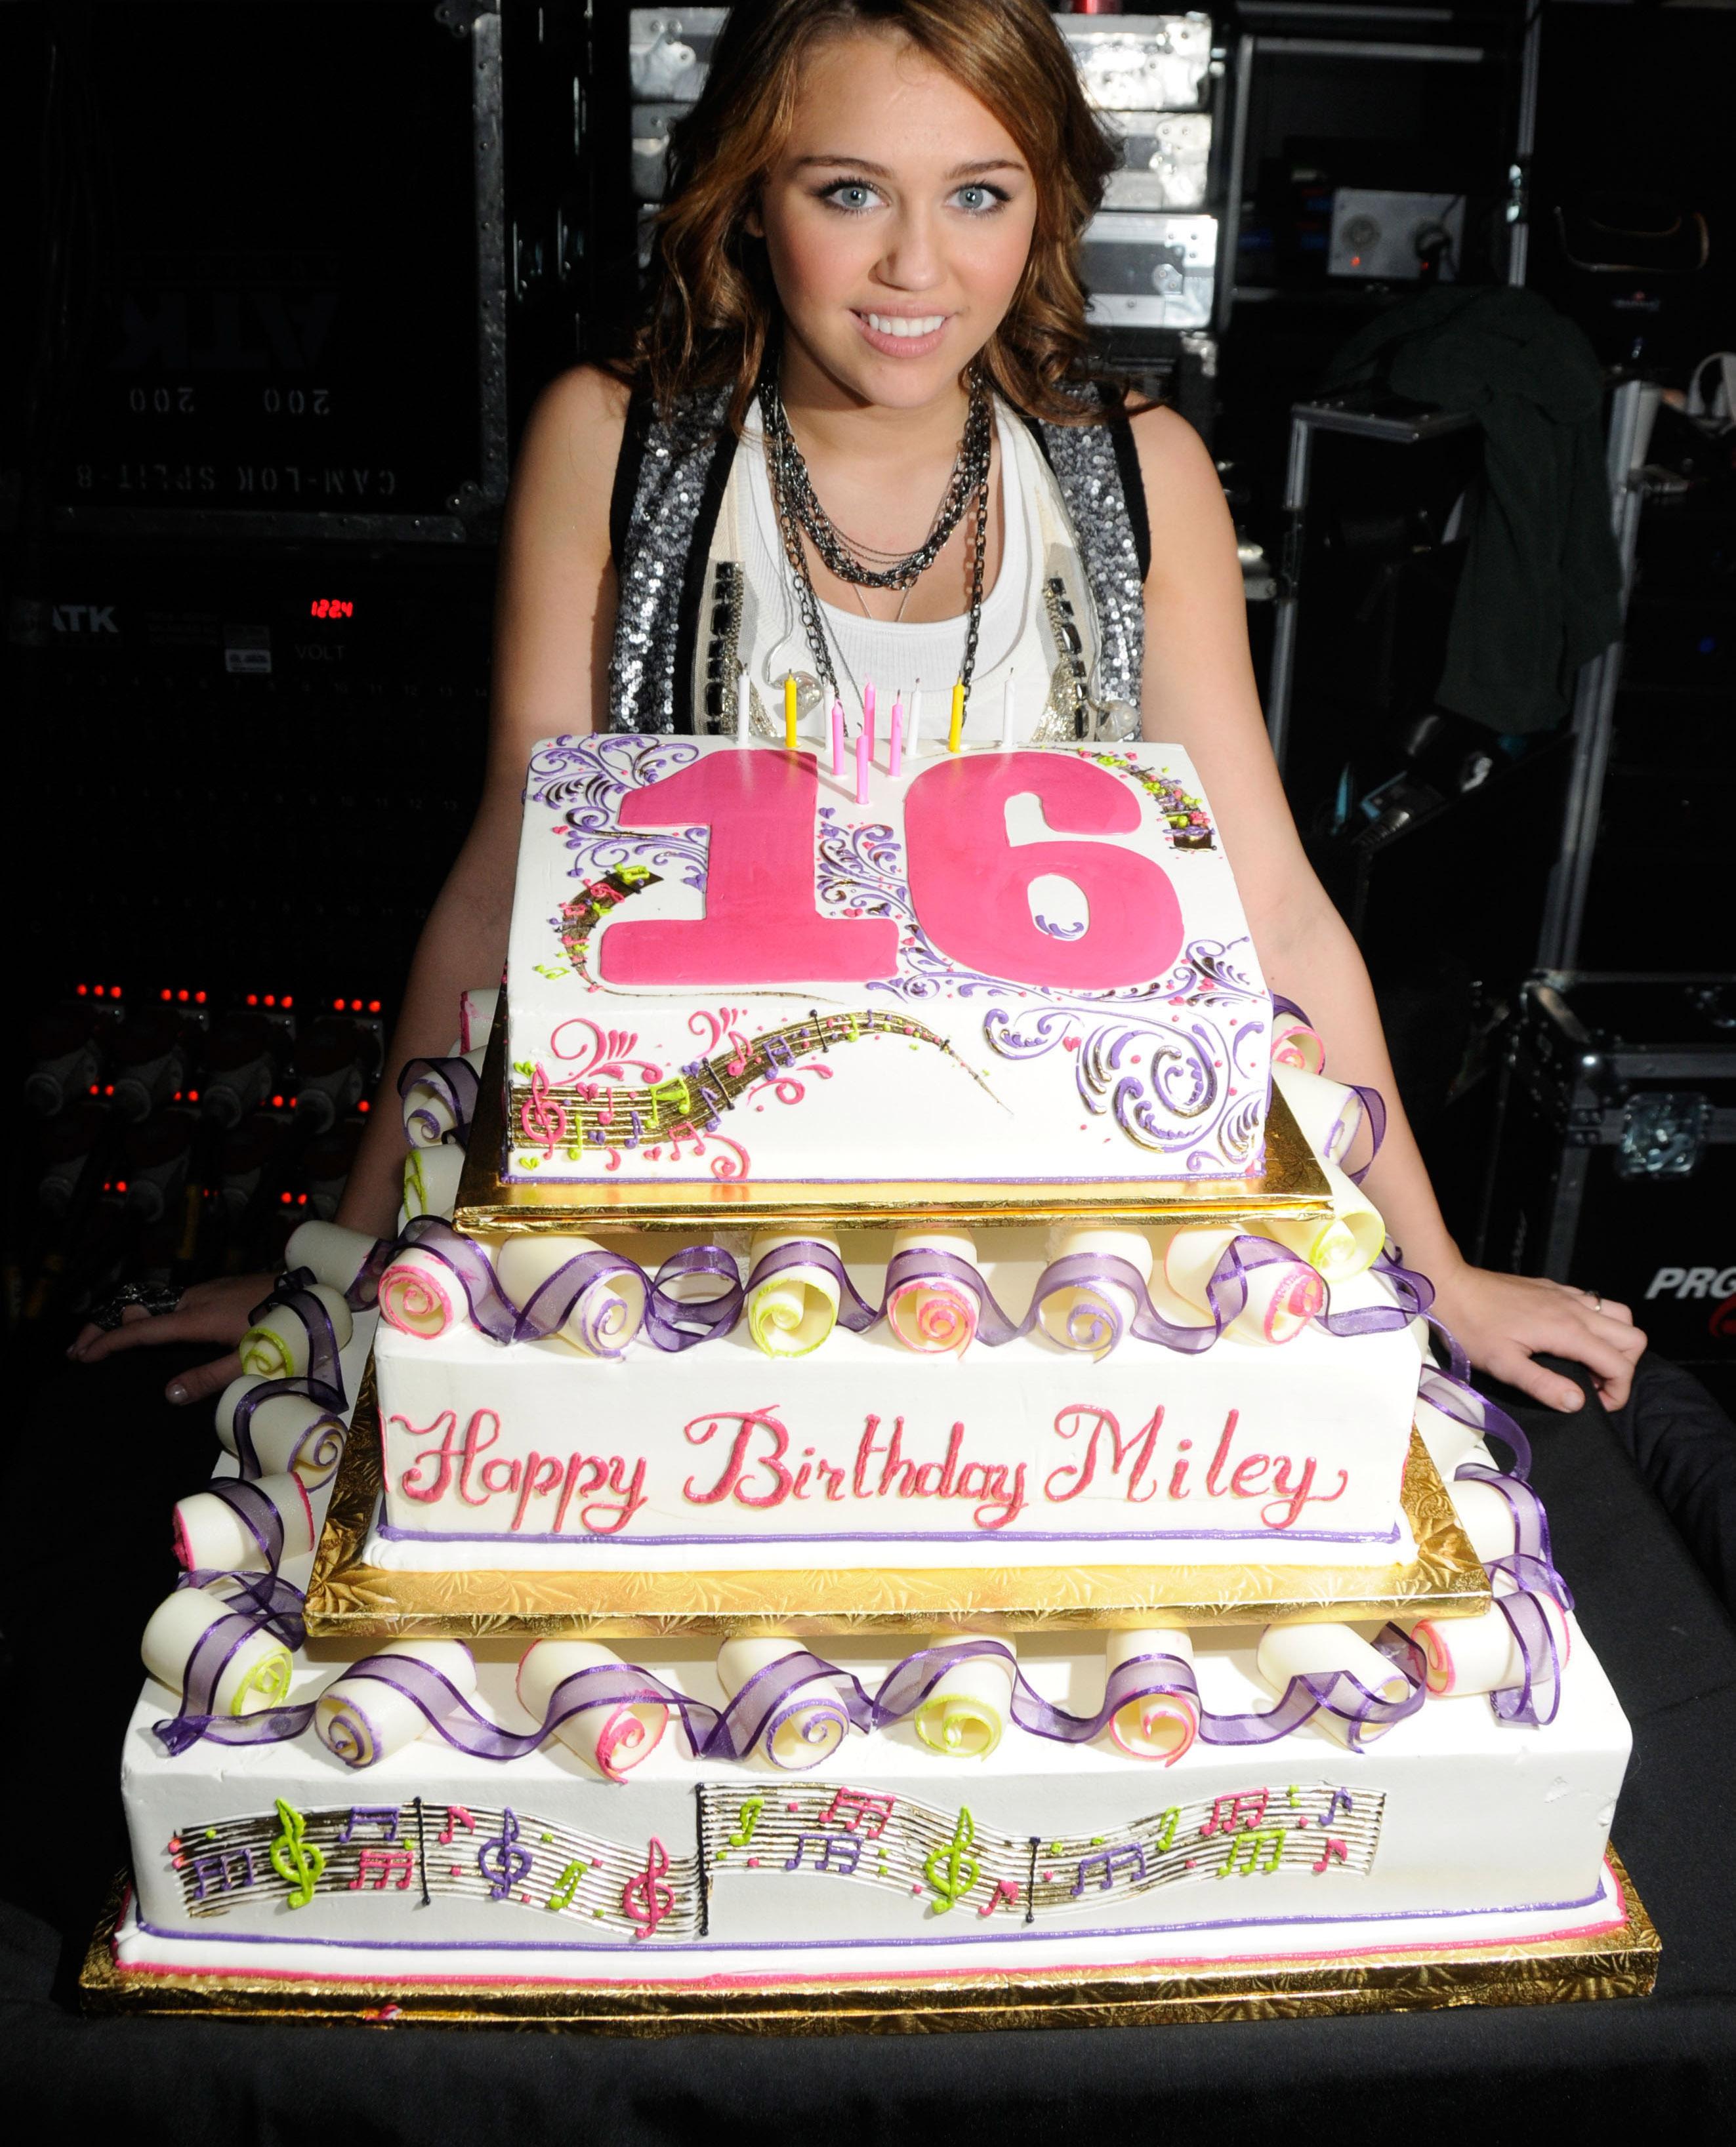 12 insane cakes your